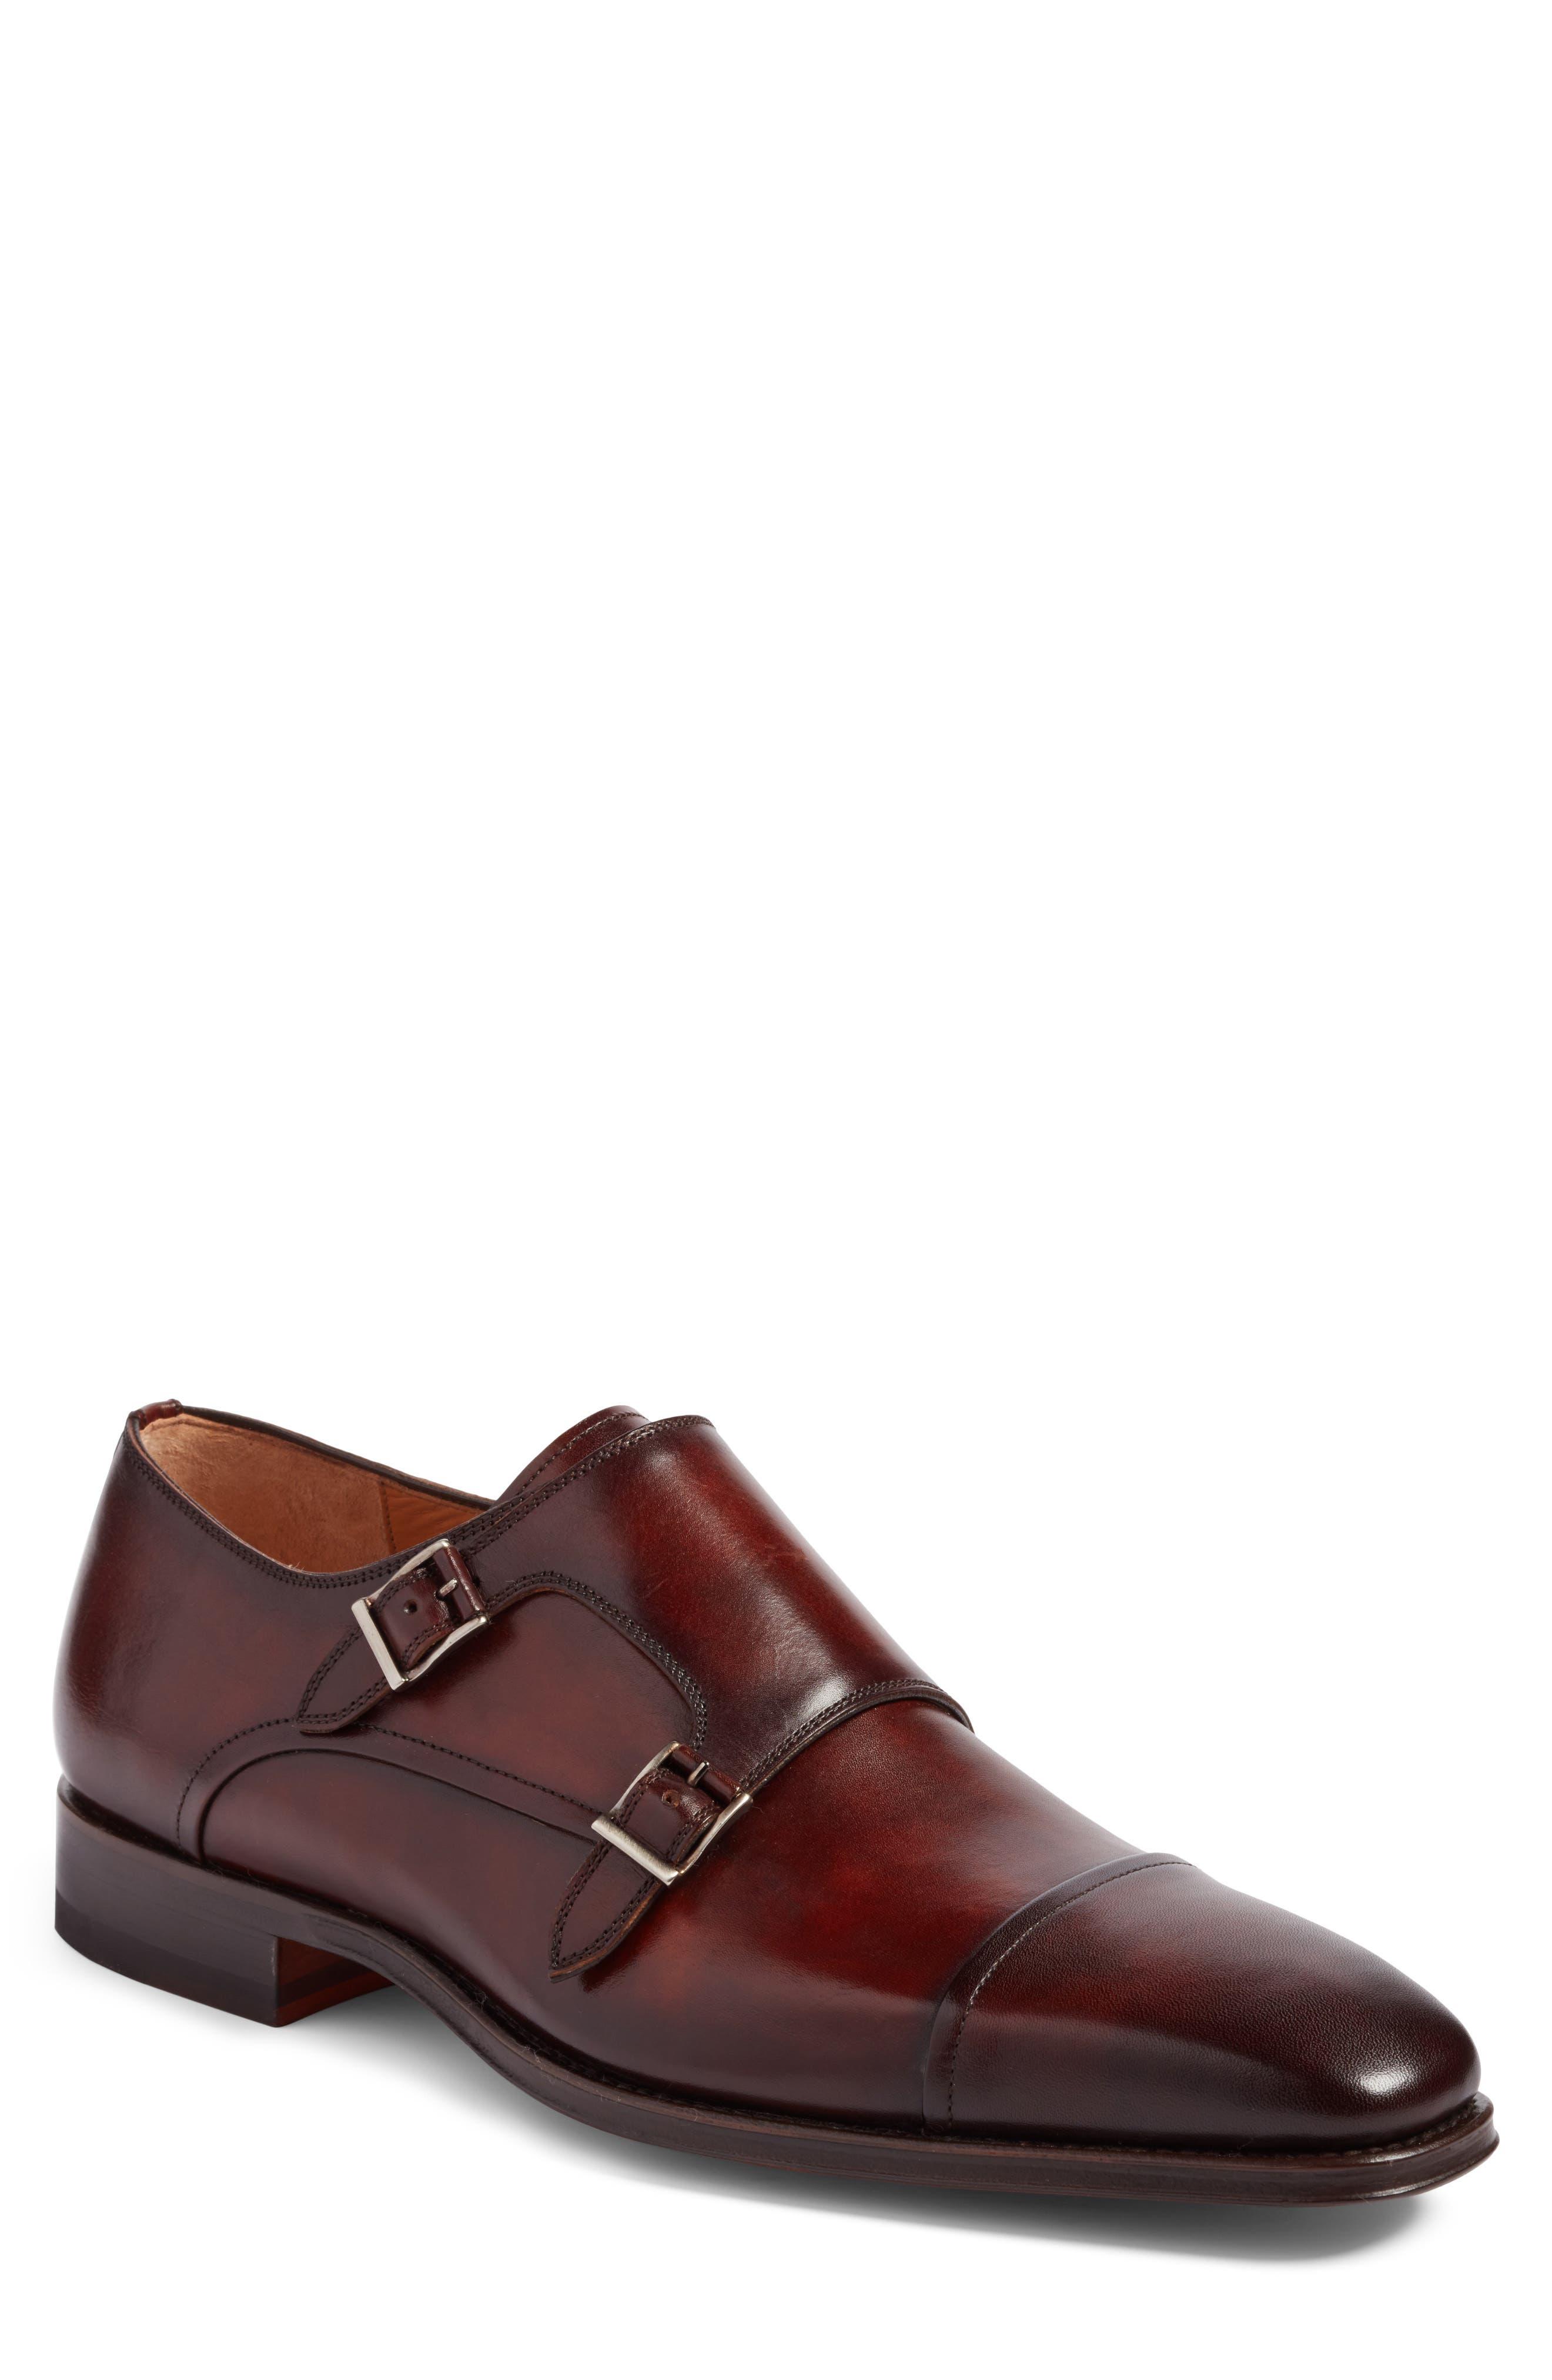 Main Image - Magnanni Silvio Double Monk Strap Shoe (Men)